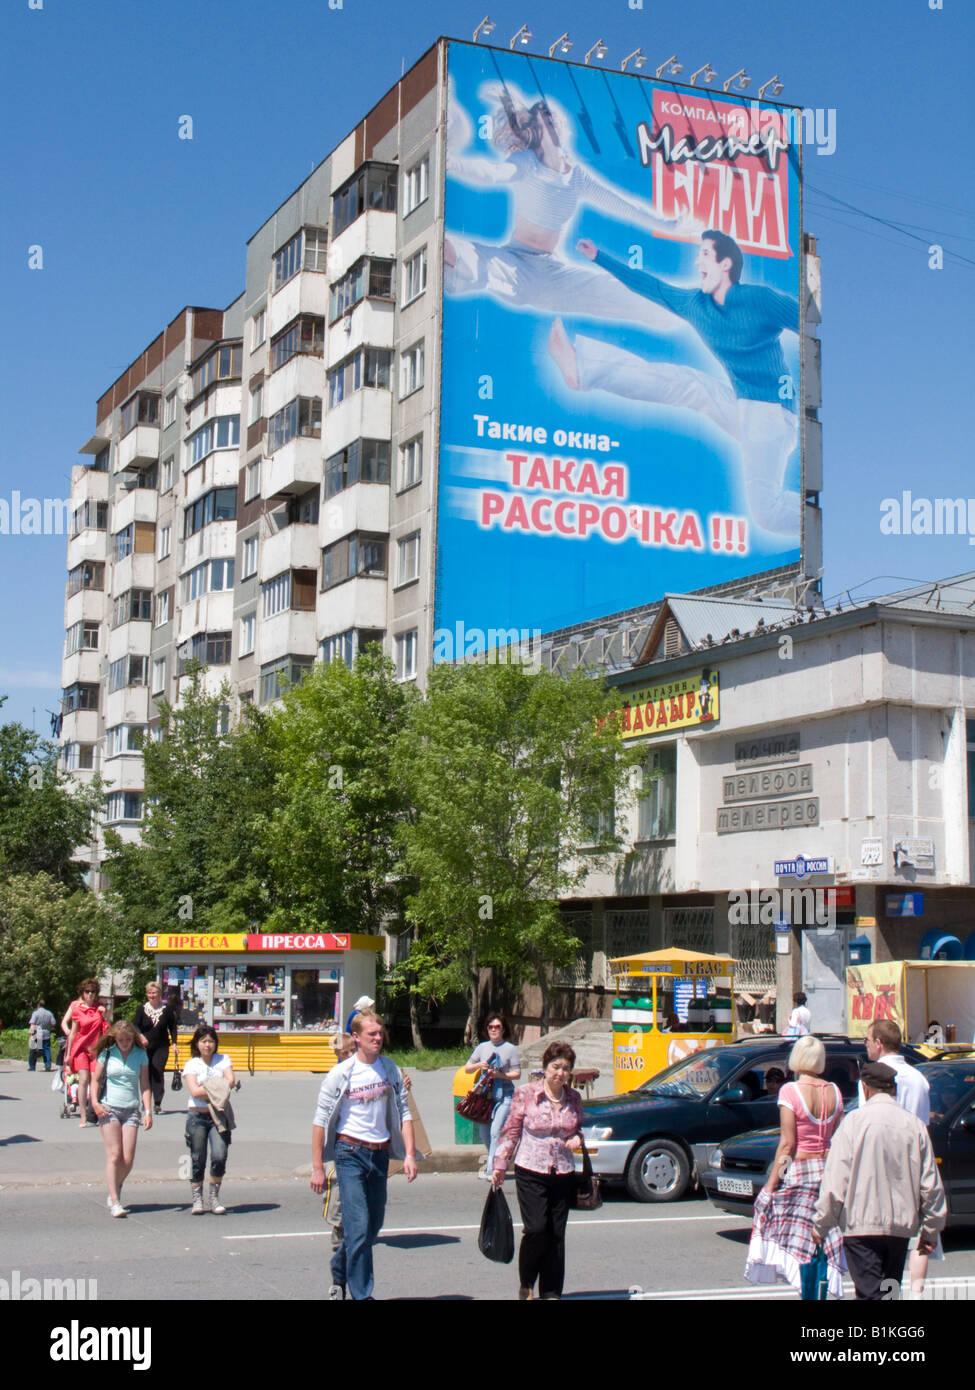 Contrast of large modern advertising billboard on old soviet era apartment block in Yuzhno Sakhalinsk Sakhalin Russia - Stock Image